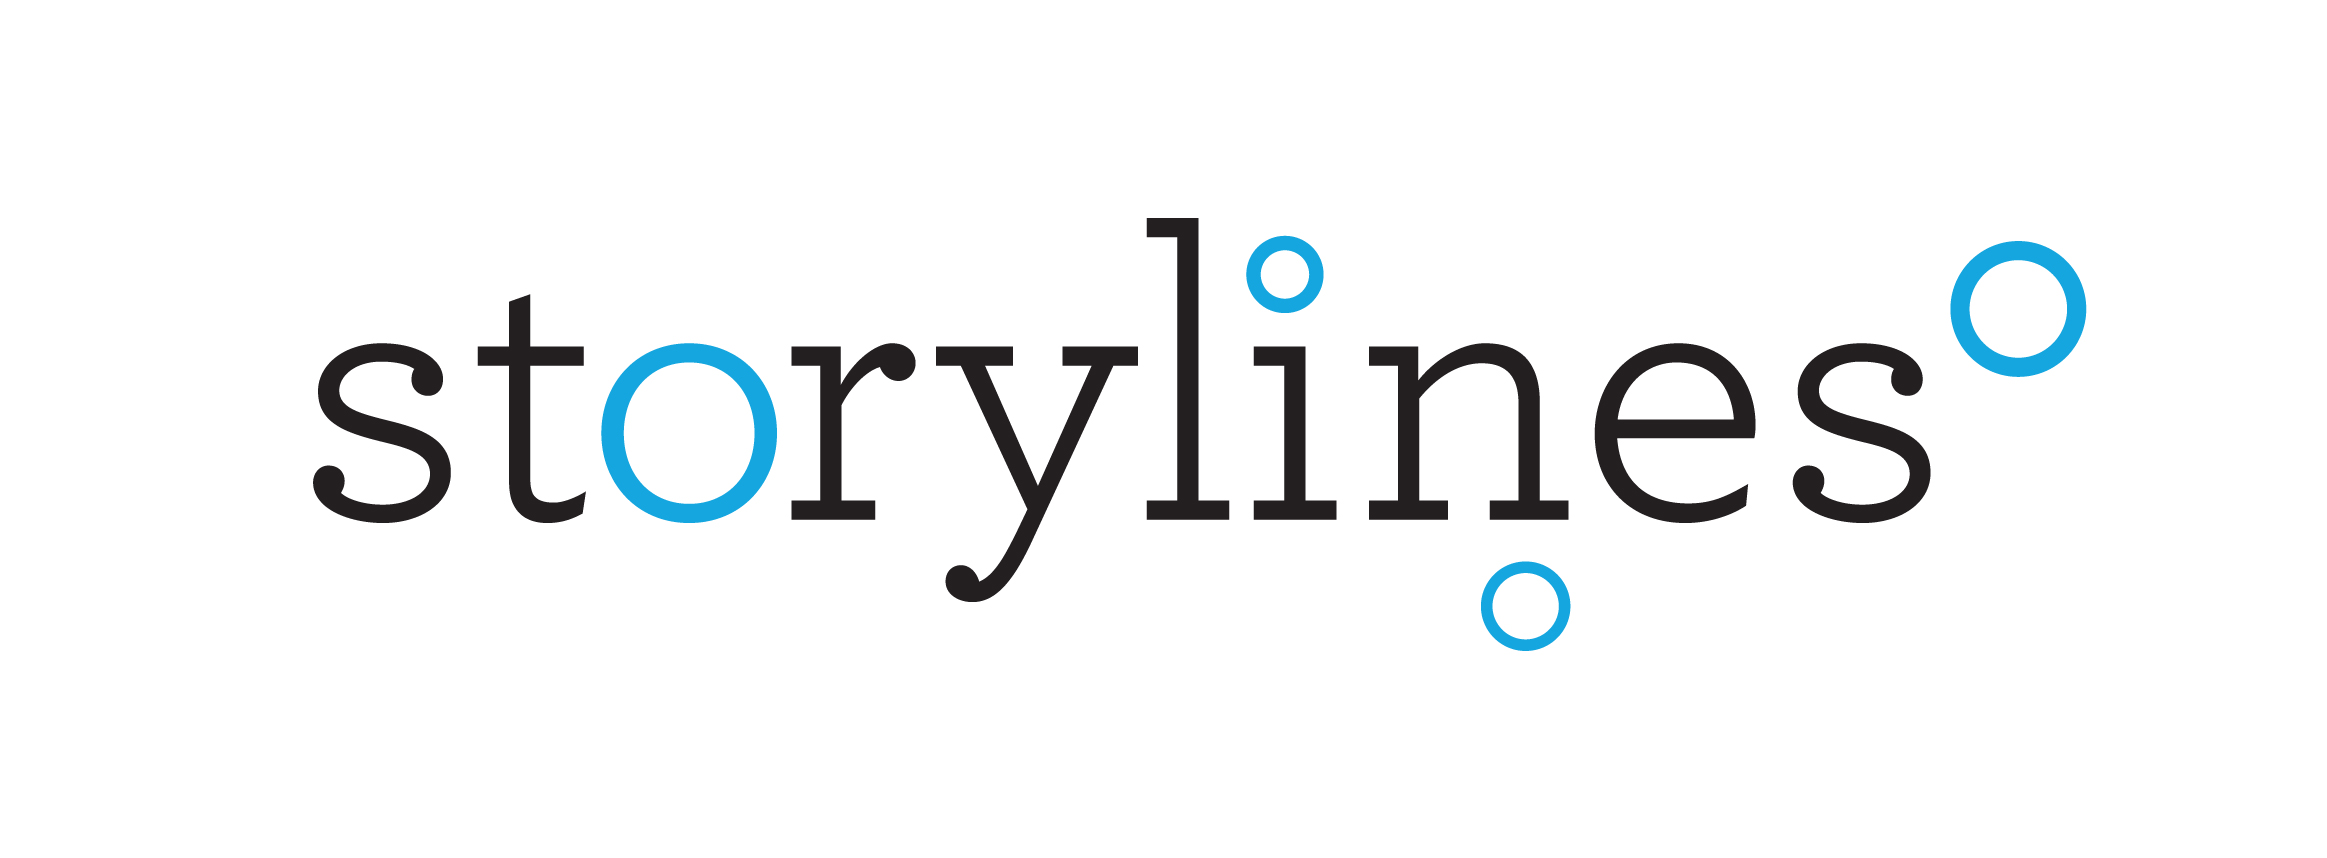 Storylines logo